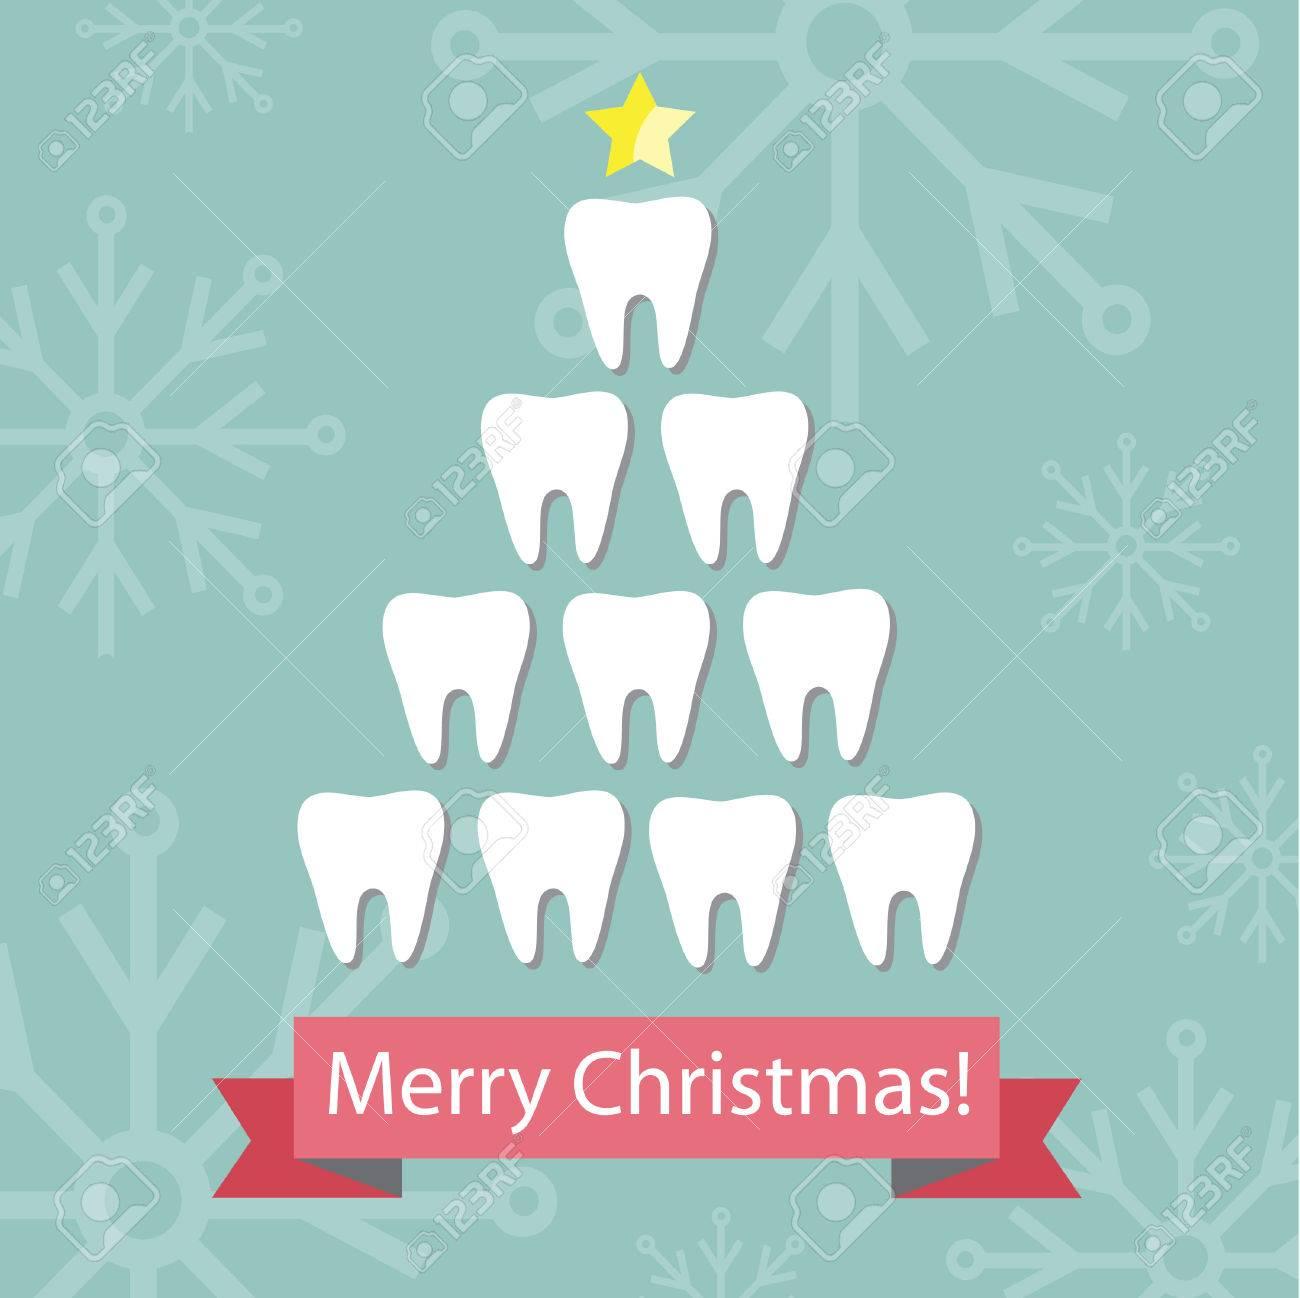 Dental Christmas Card. Royalty Free Cliparts, Vectors, And Stock ...